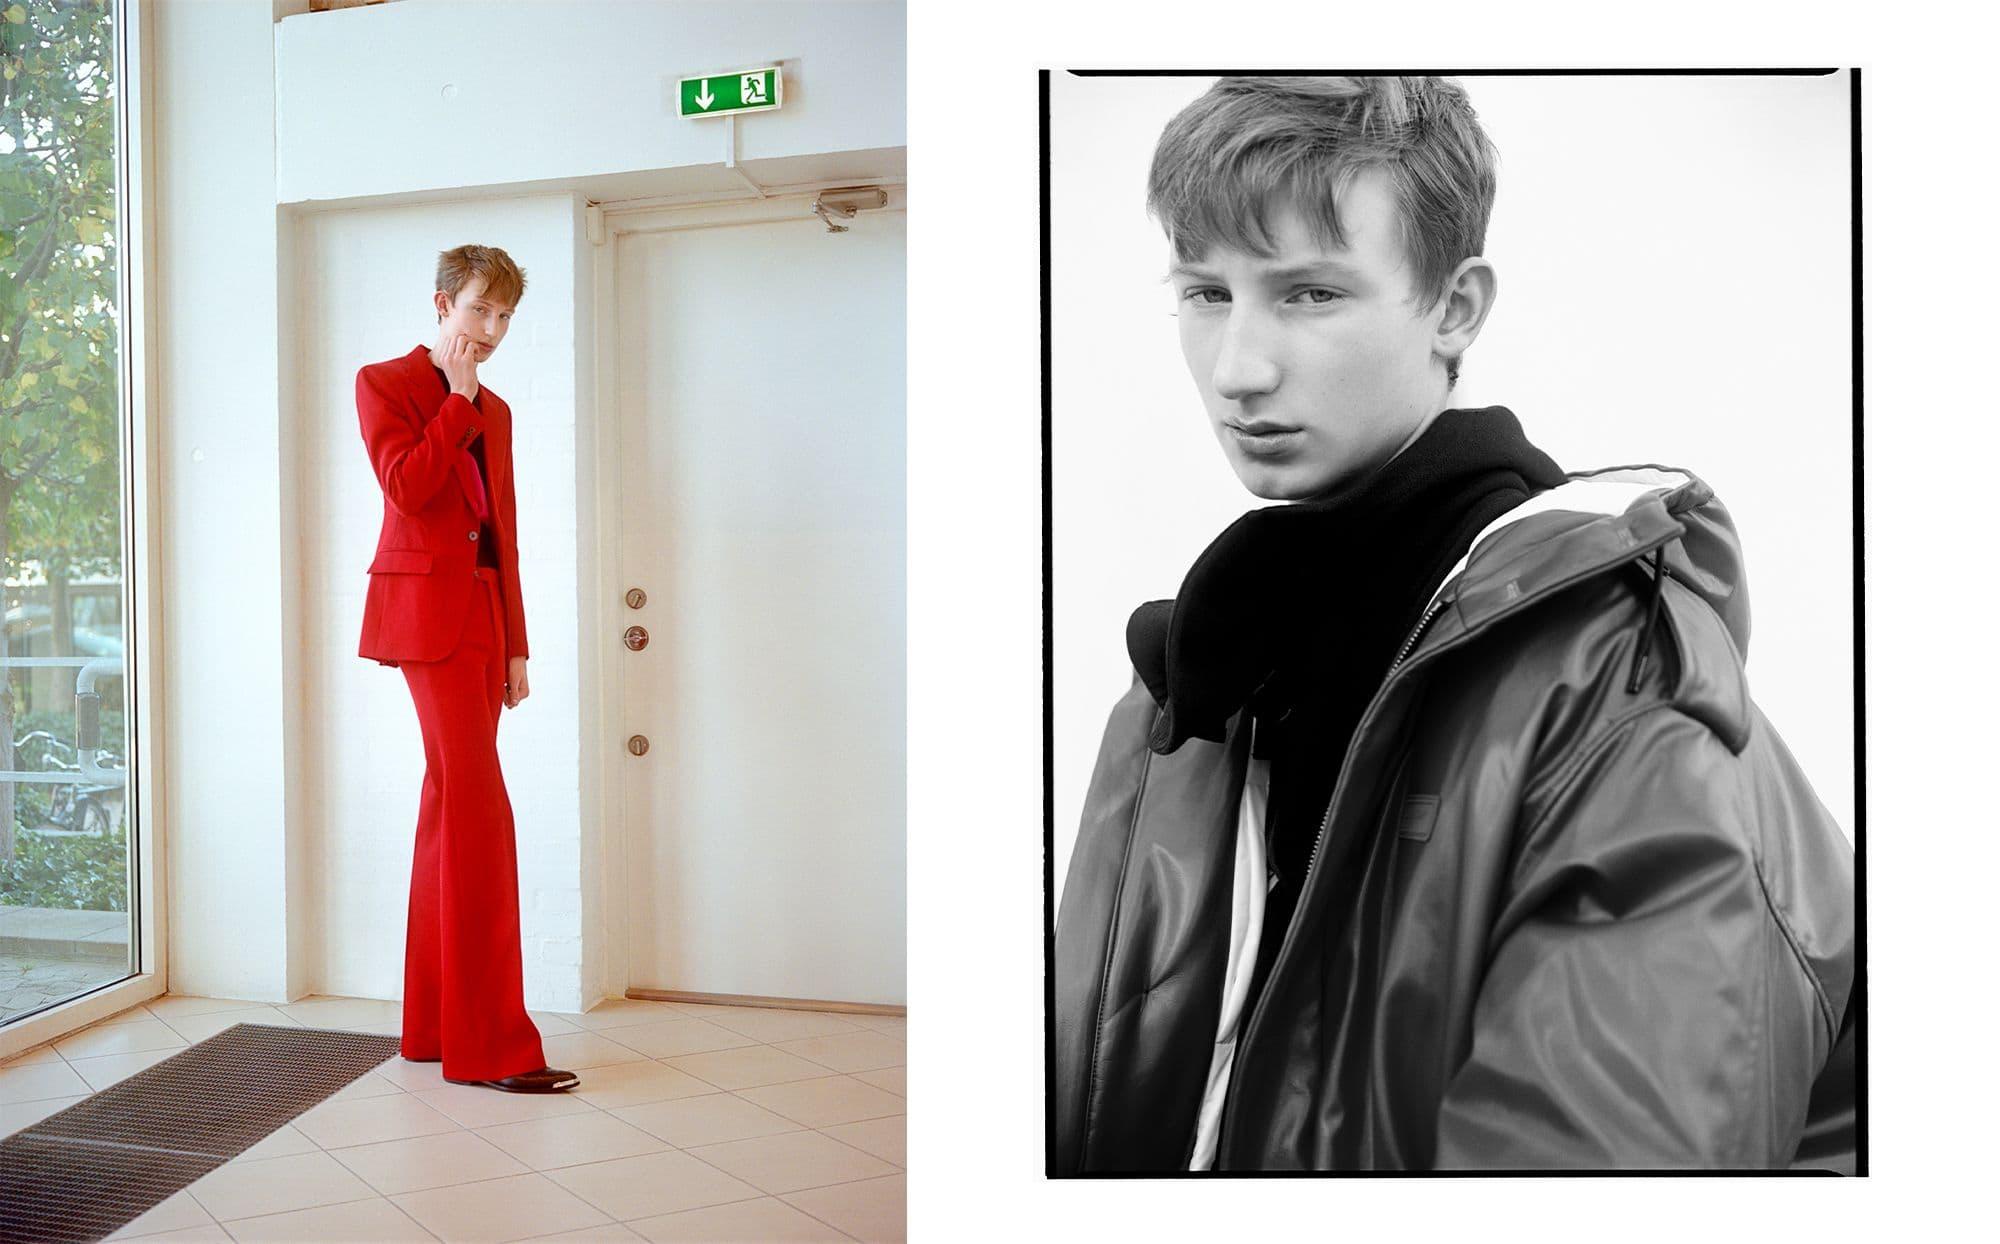 marcus-ljunggren-thegreatestmagazine-1